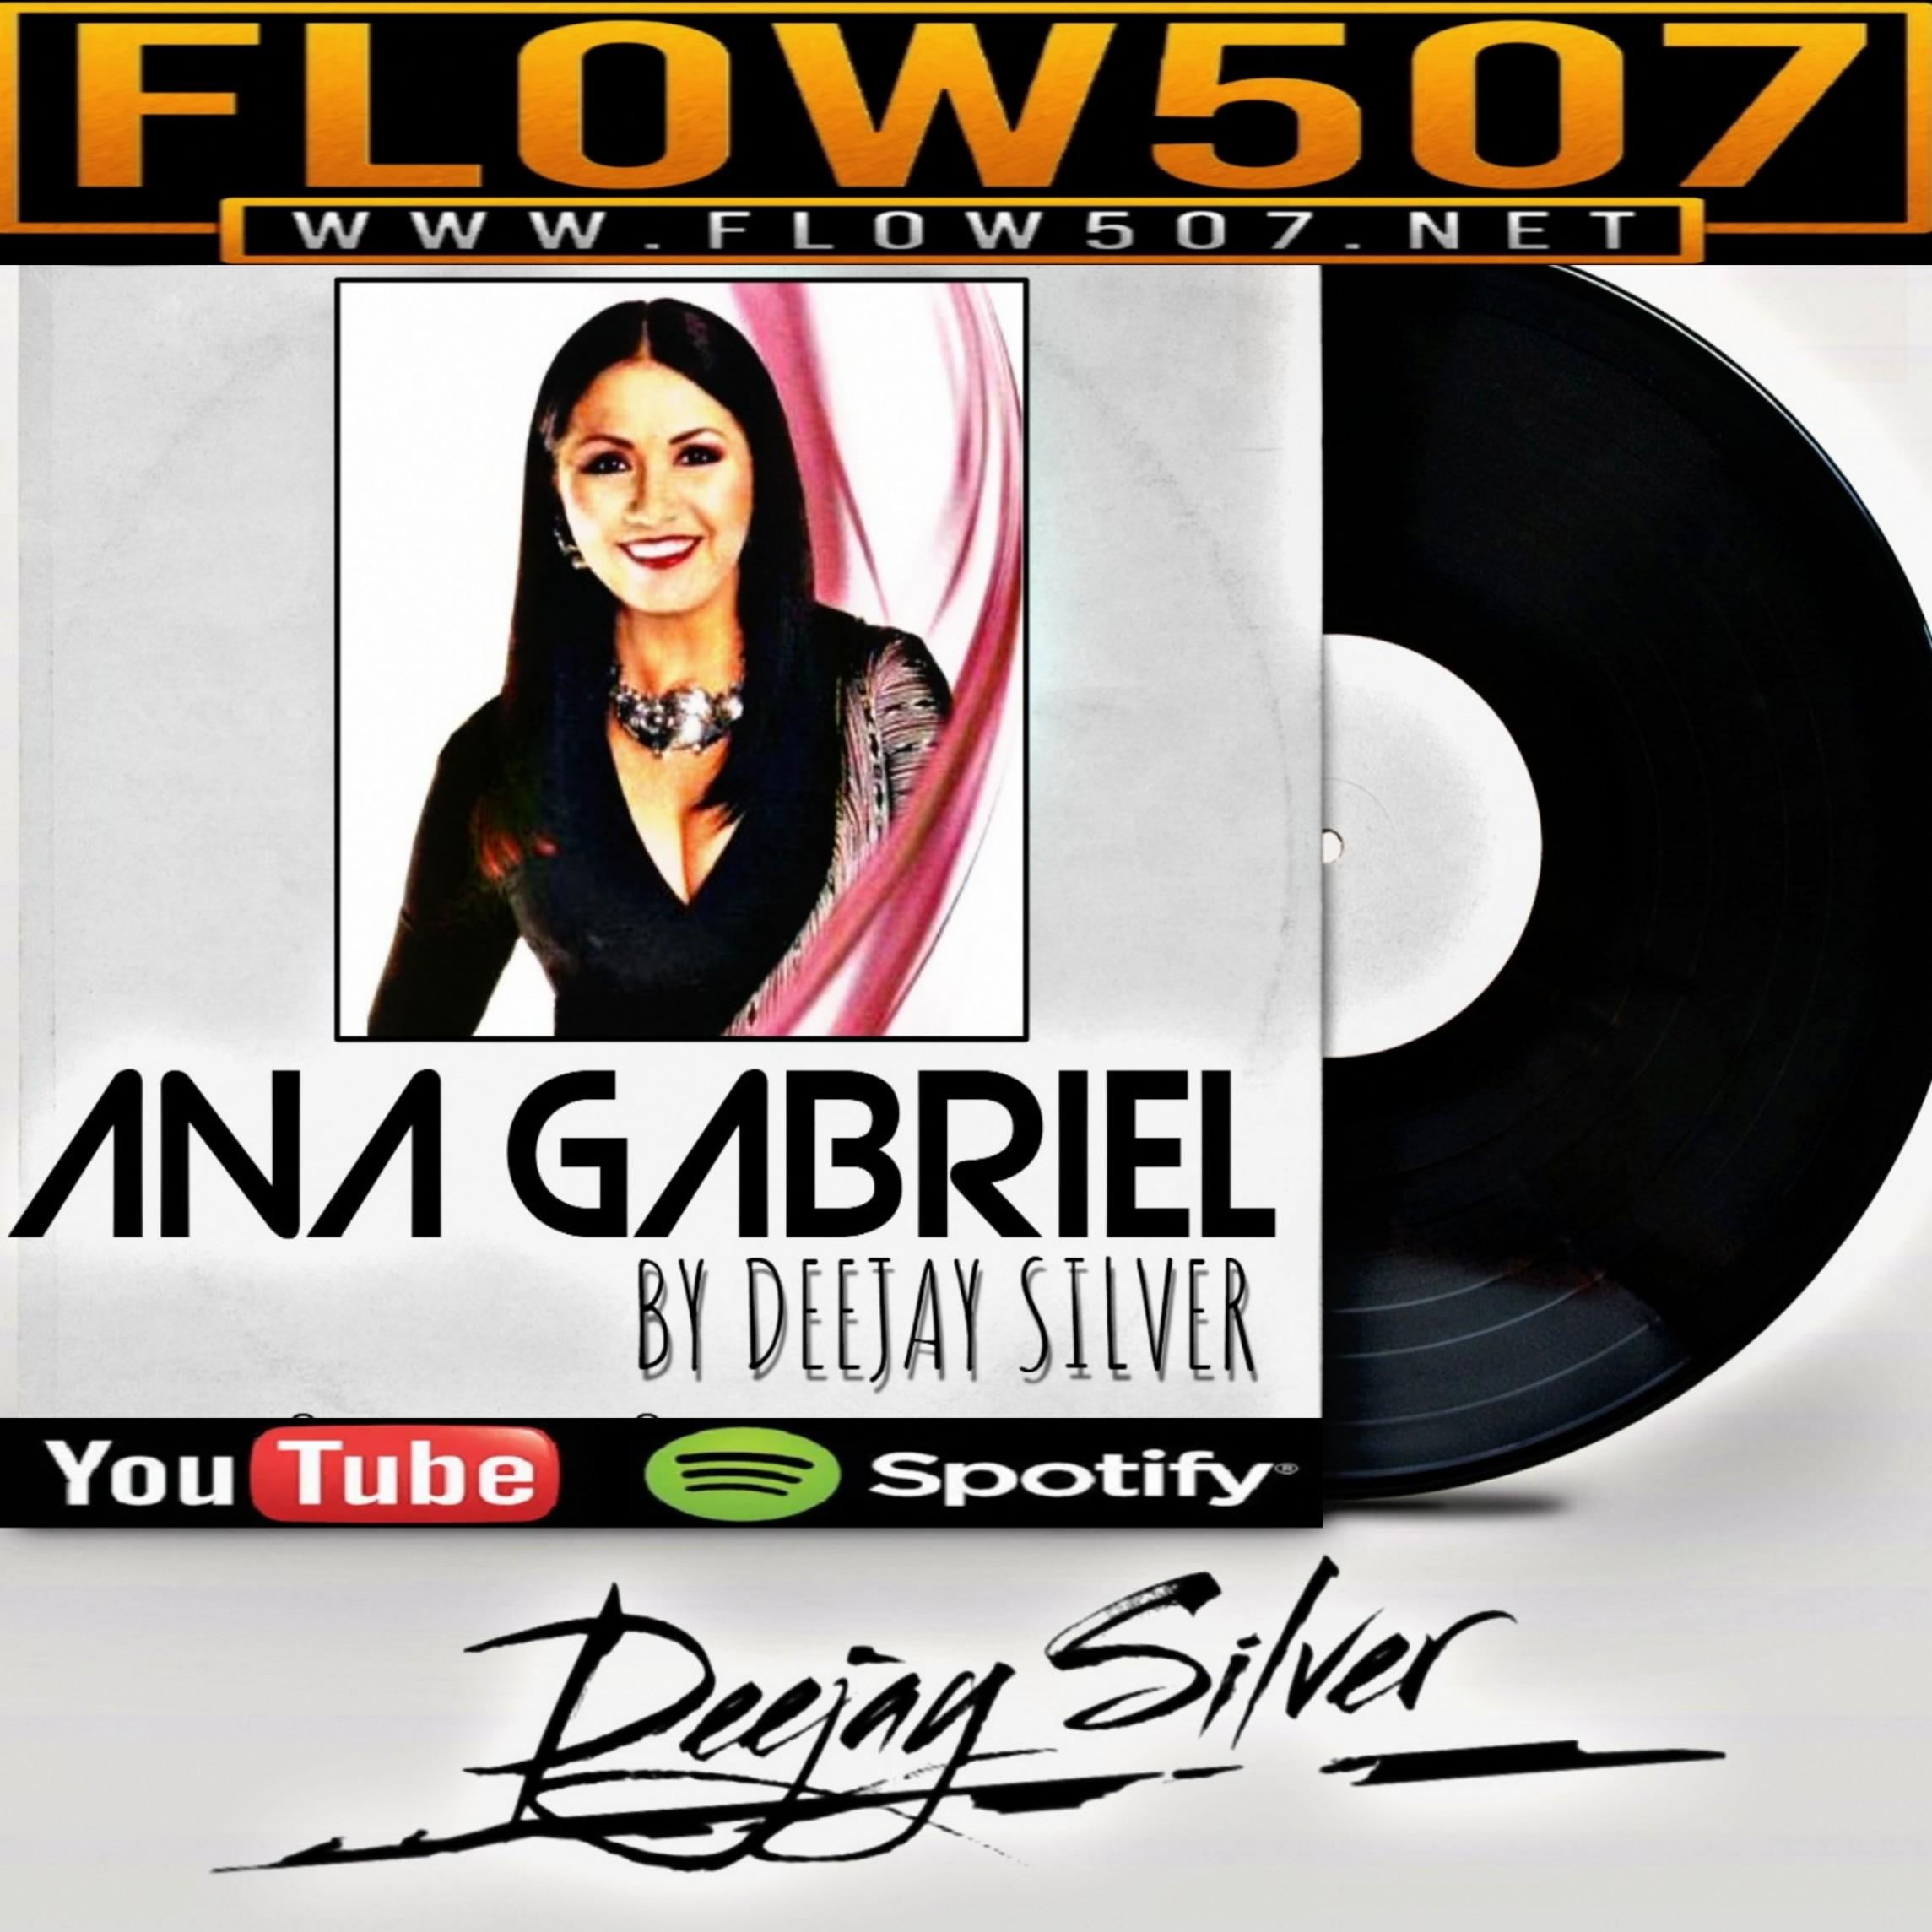 DEEJAY SILVER - TRIBUTO A ANA GABRIEL